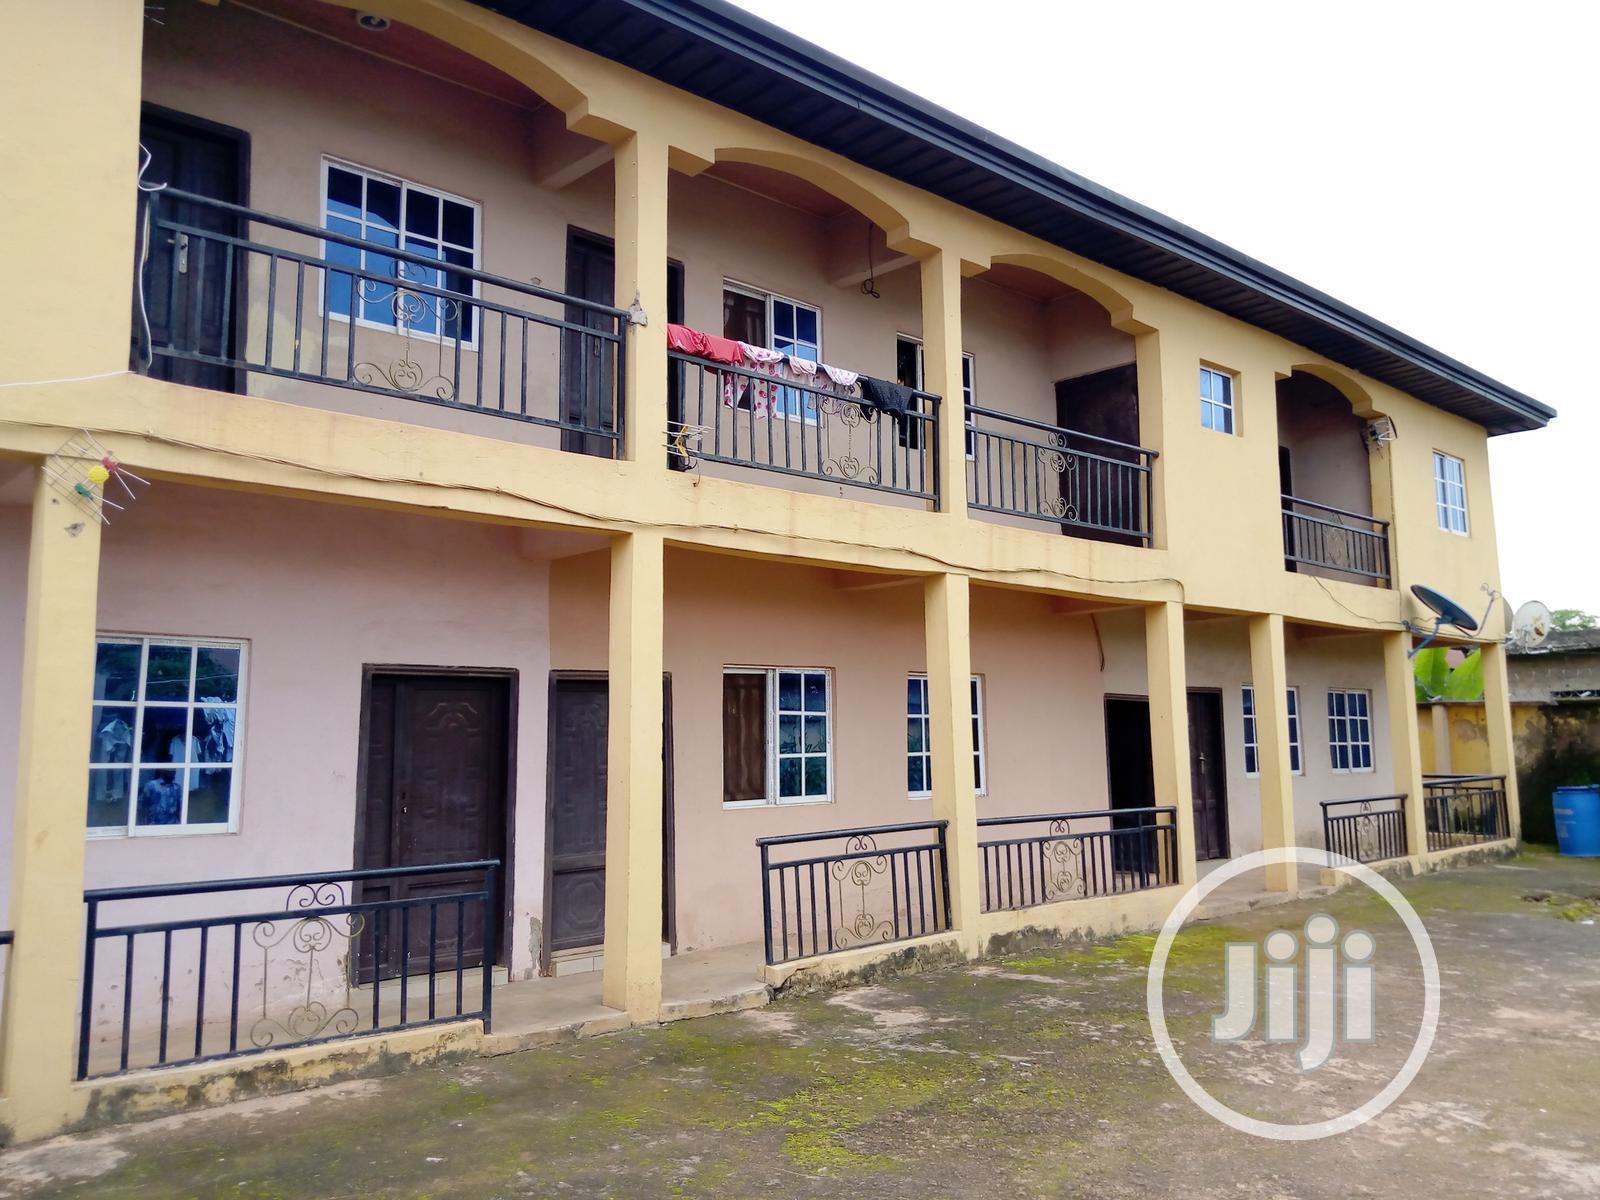 6 Units Of 2-bedroom Apartments.